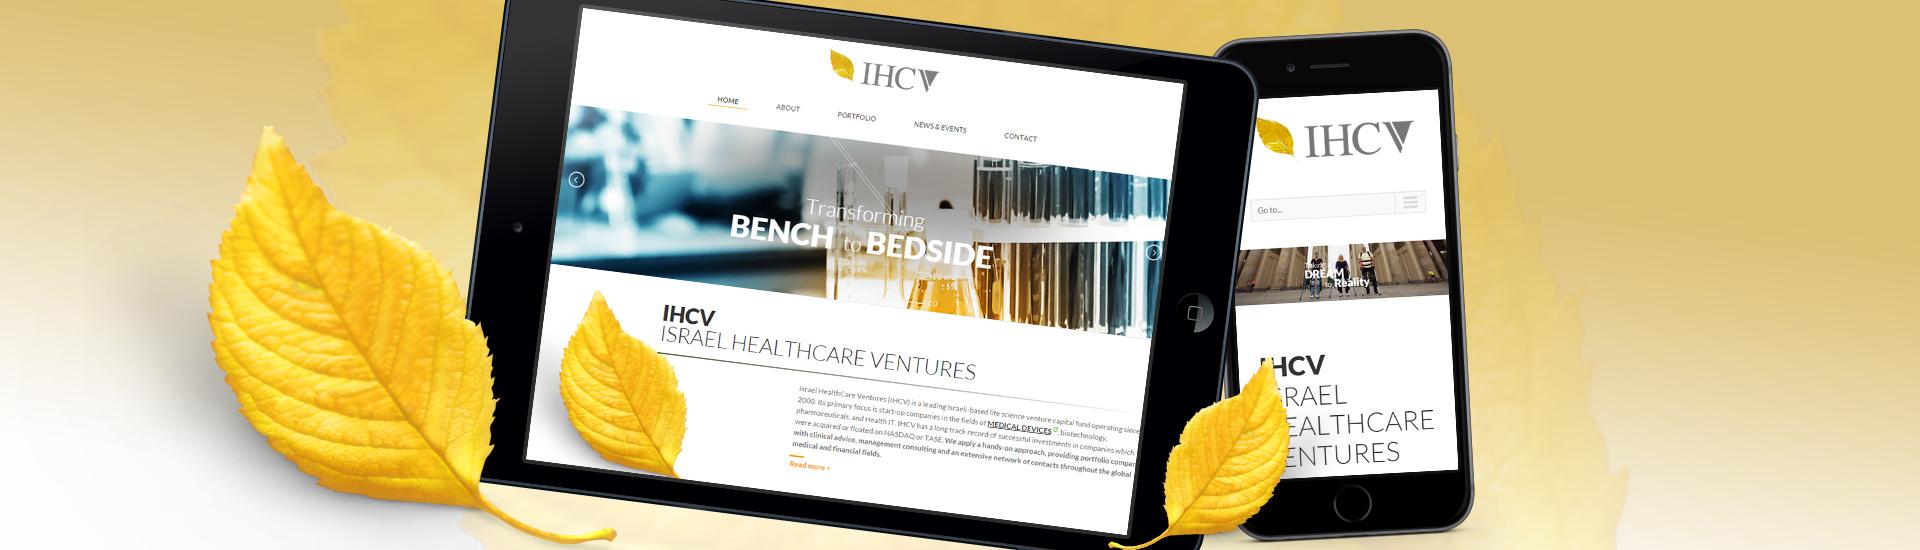 IHCV תצוגת טאבלט ומובייל